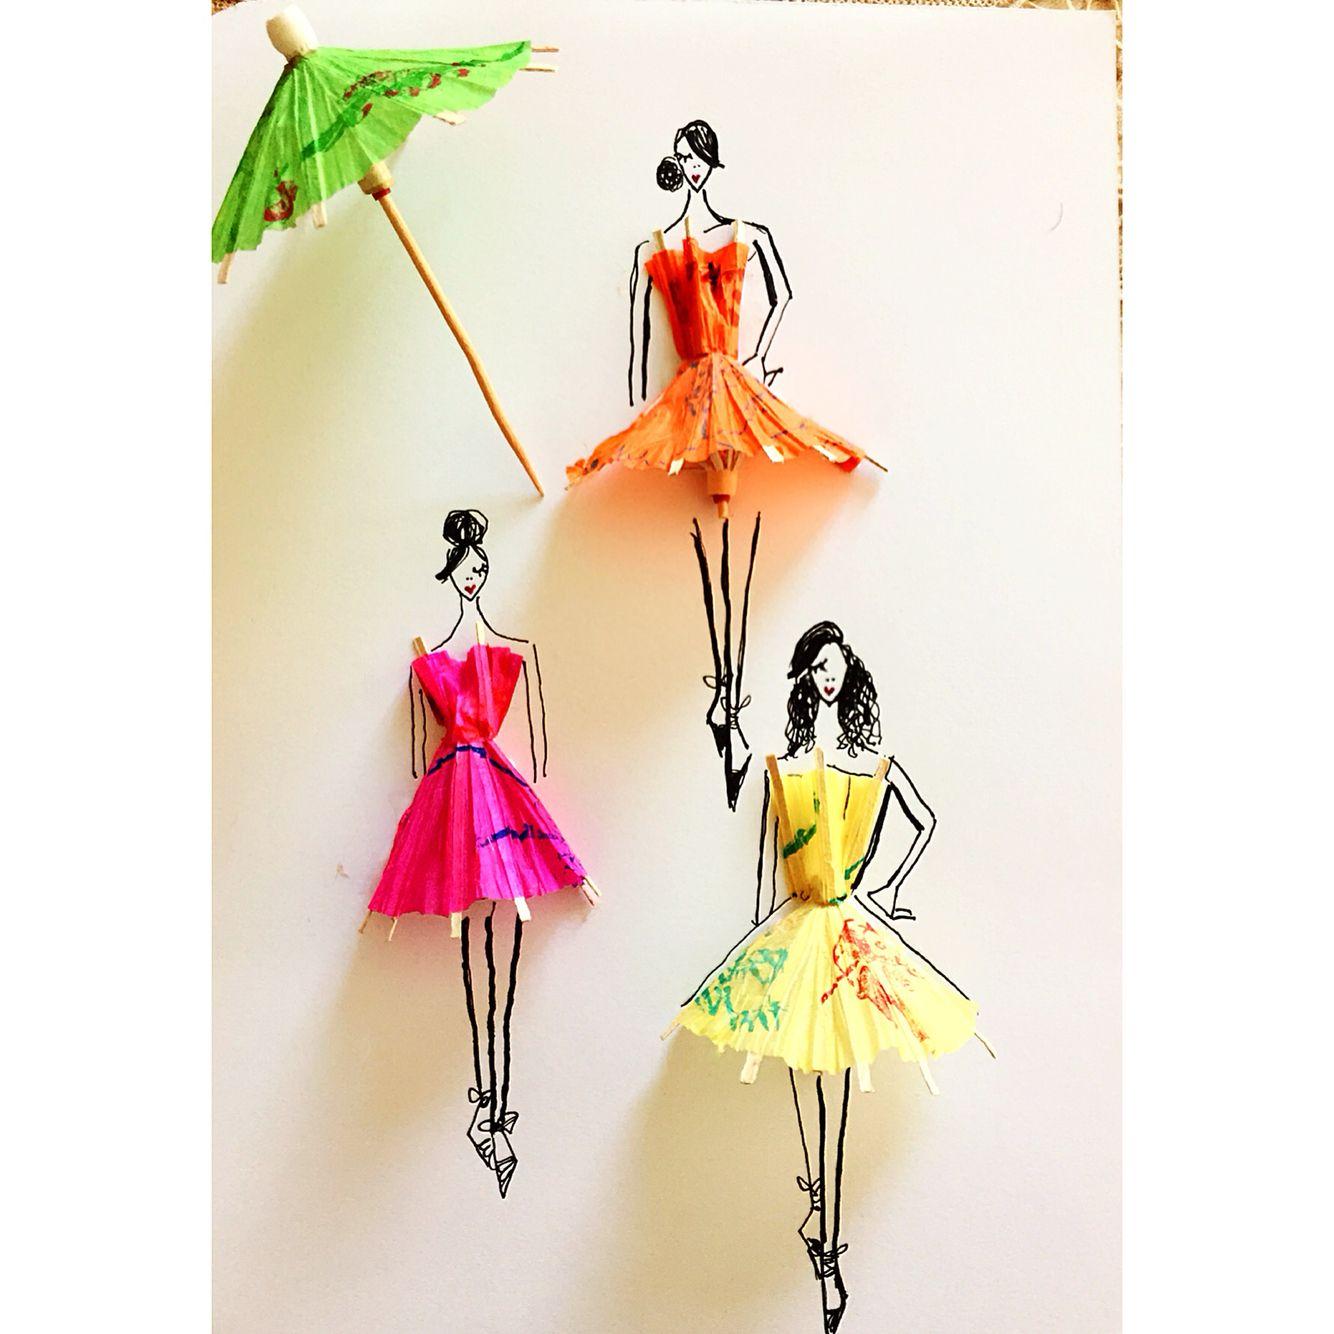 Cocktail umbrella illustration by sara japanwalla #sarajaps